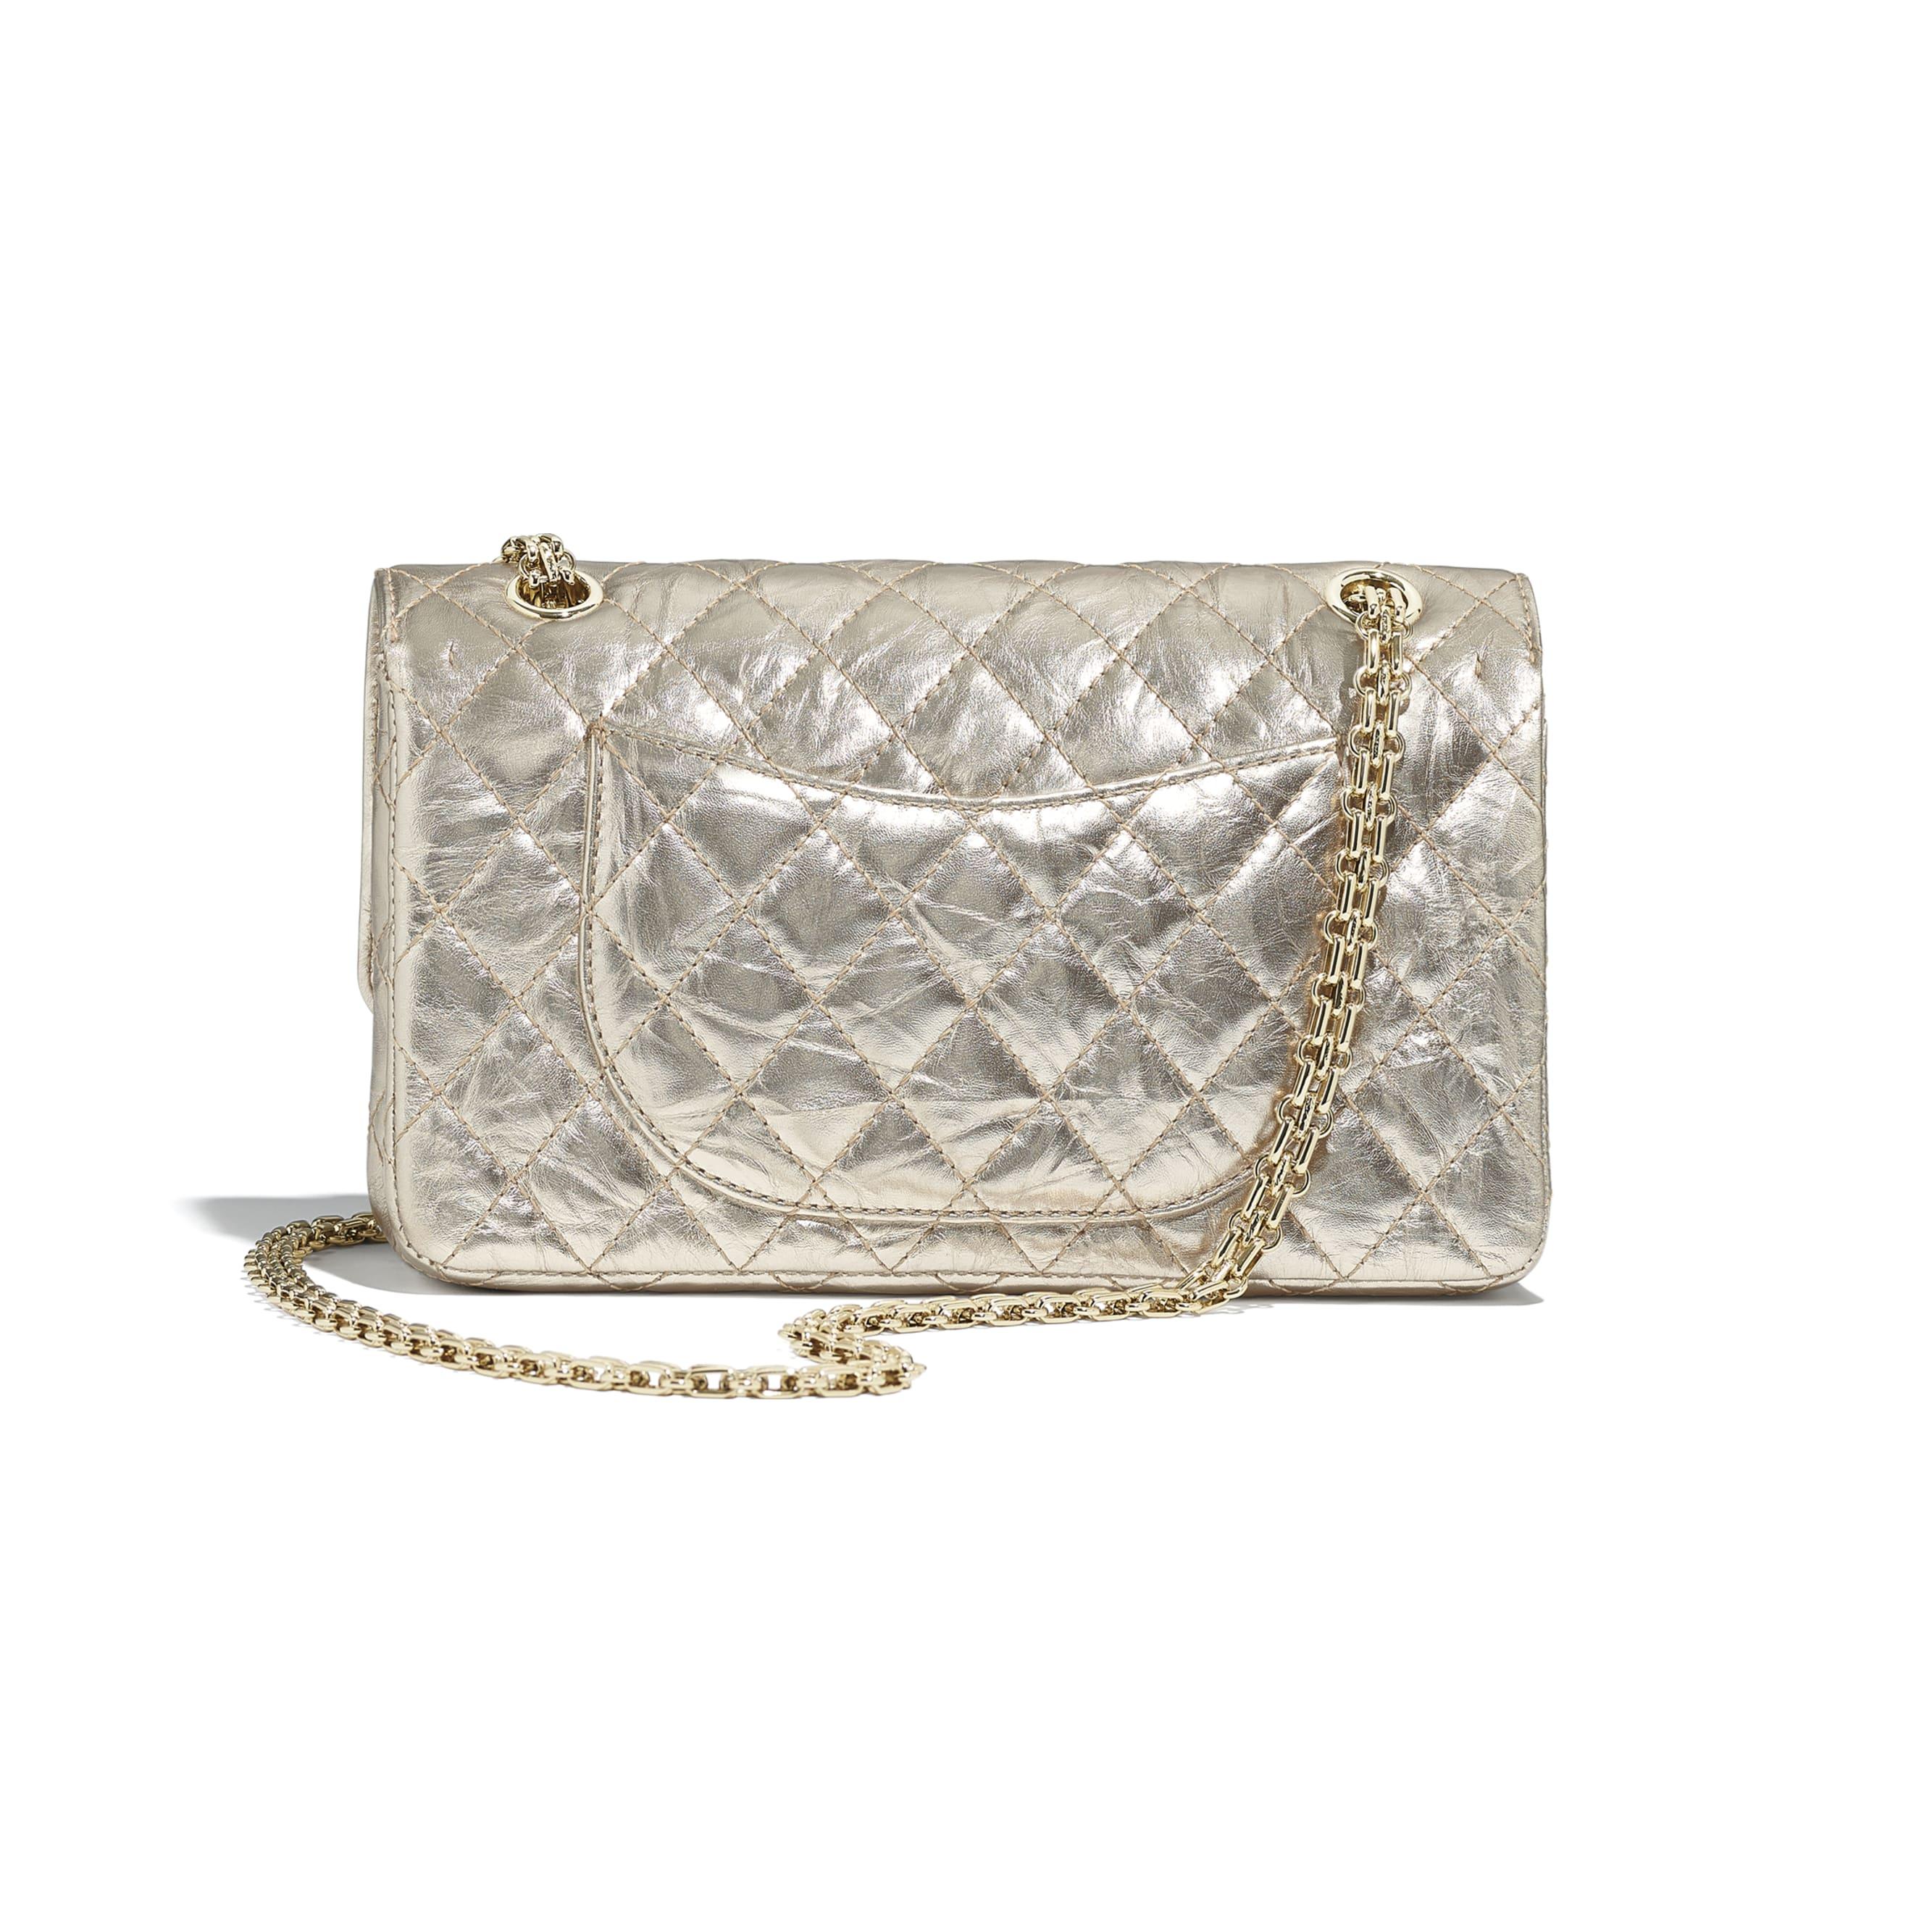 2.55 Handbag - Light Gold - Metallic Crumpled Calfskin & Gold-Tone Metal - CHANEL - Alternative view - see standard sized version